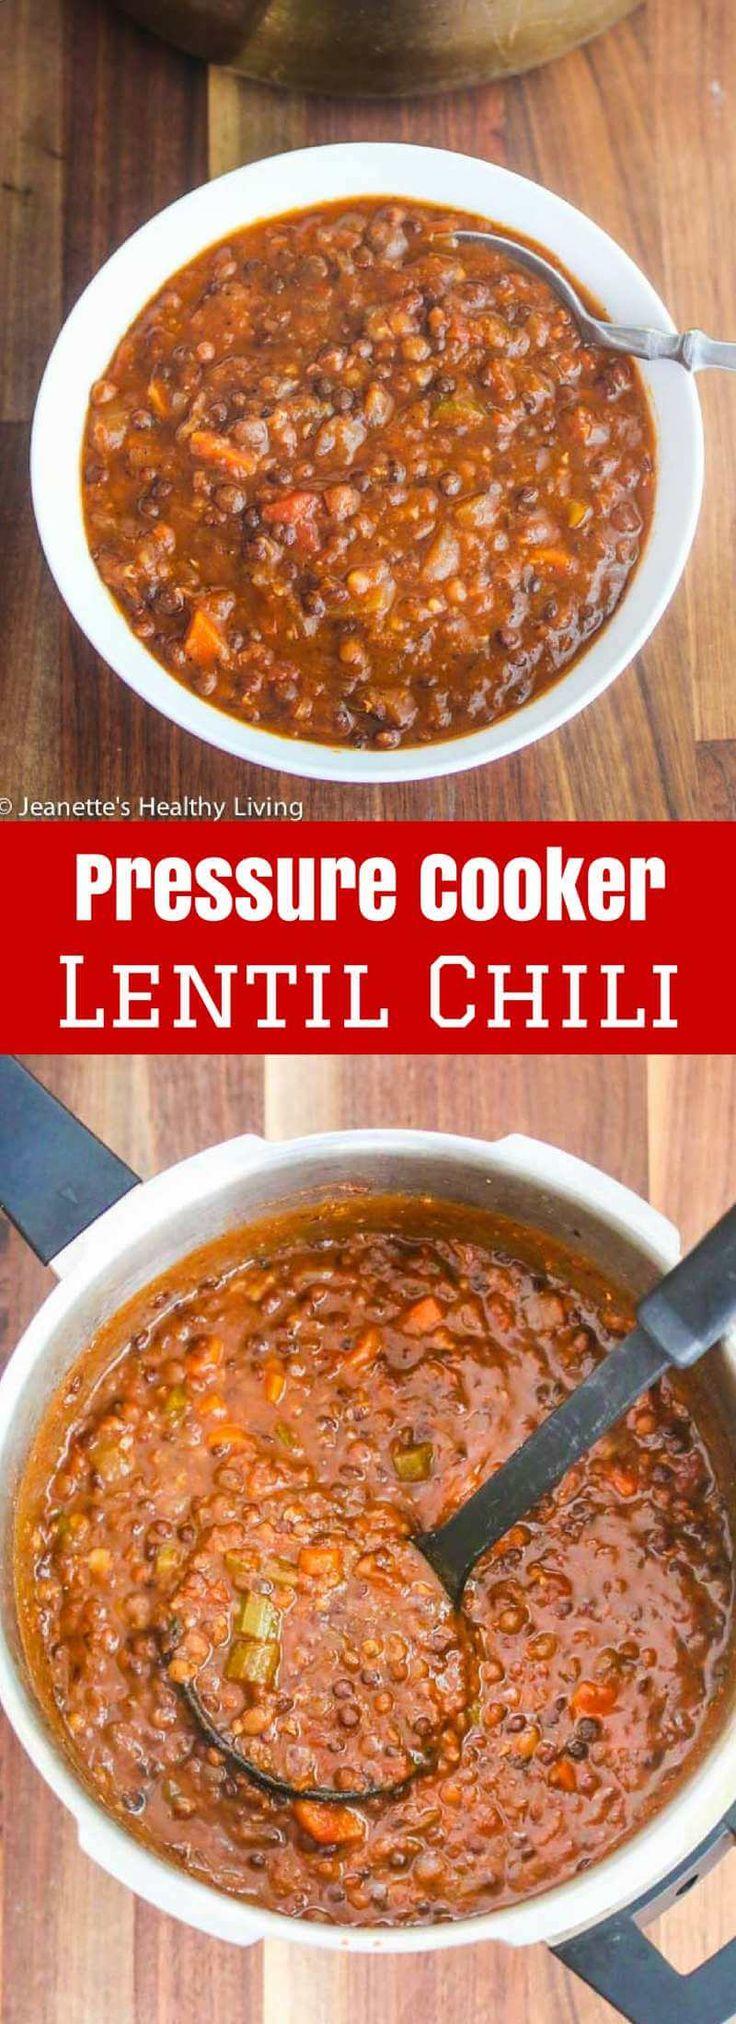 Pressure Cooker/Instant Pot Lentil Chili